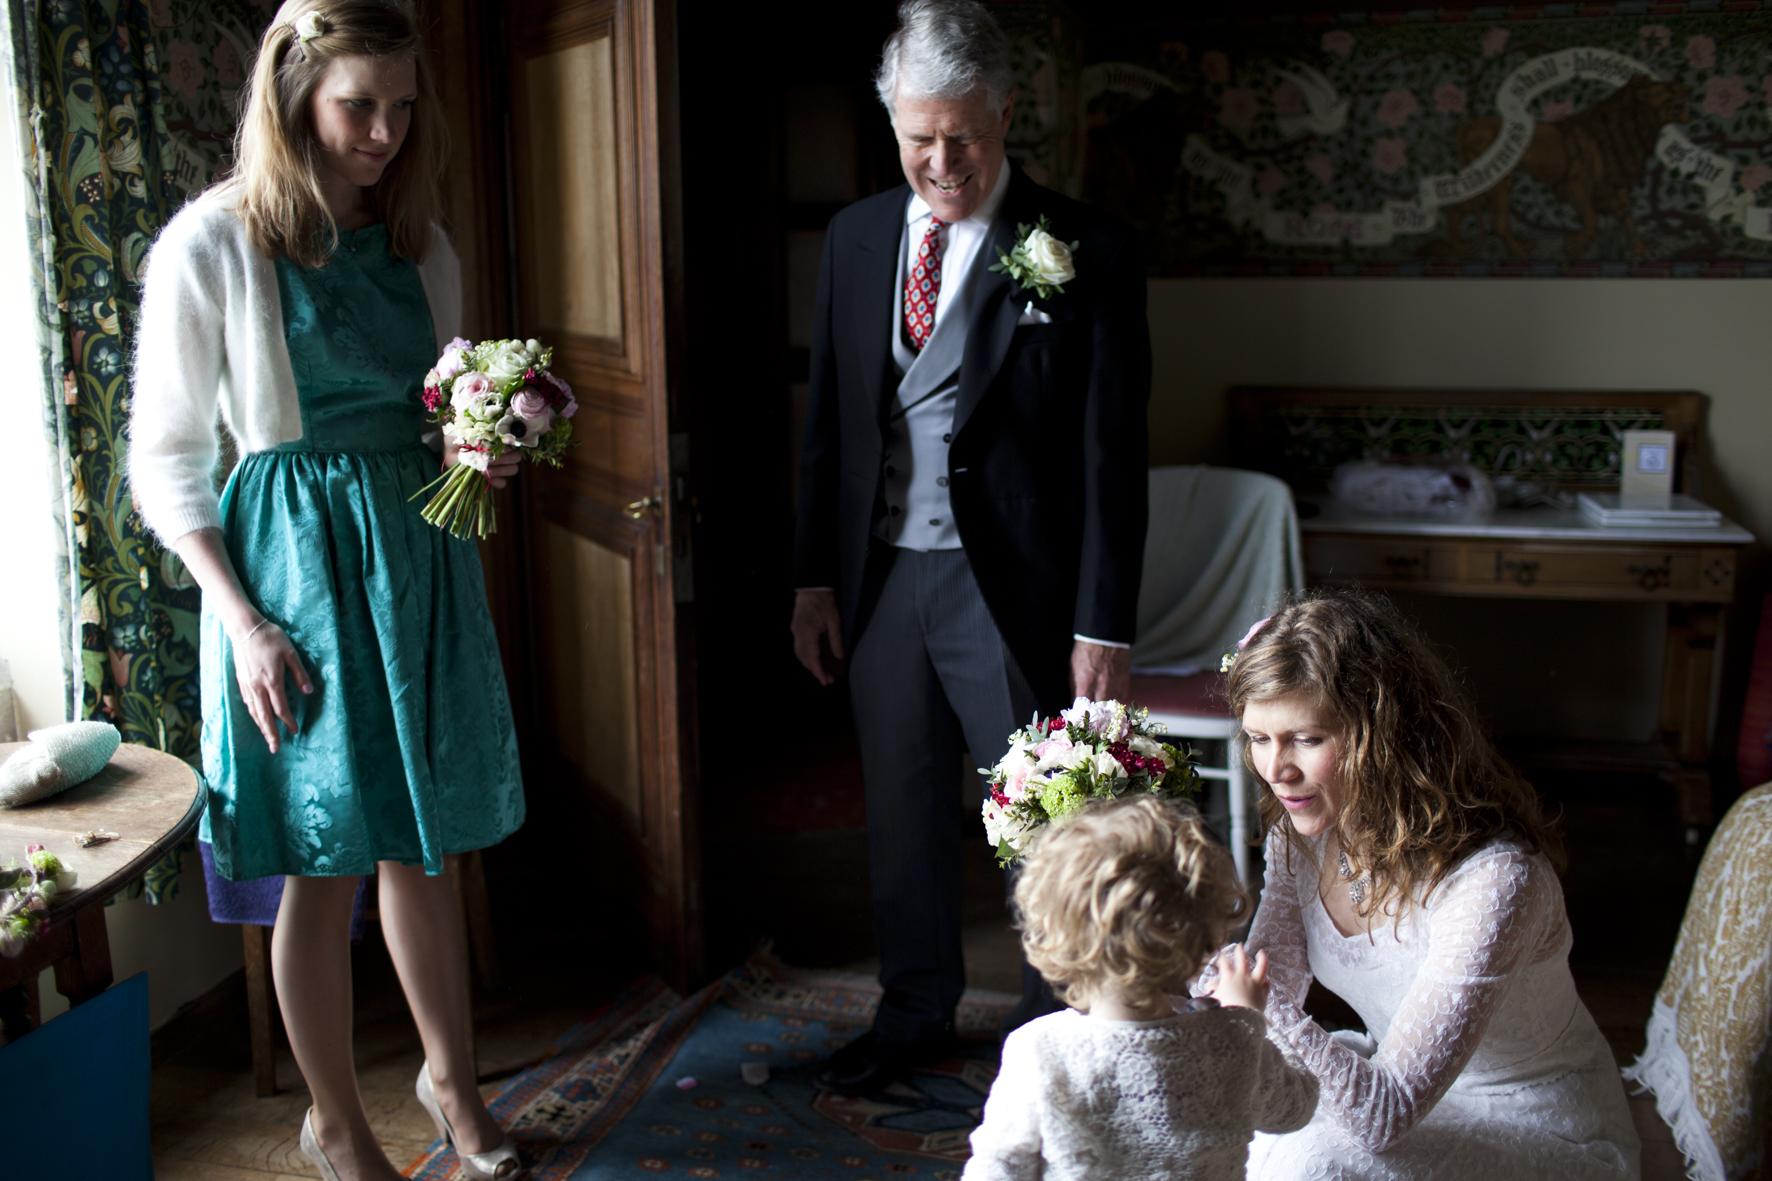 Wedding example_M&P__MG_3278_Claudia Leisinger.jpg